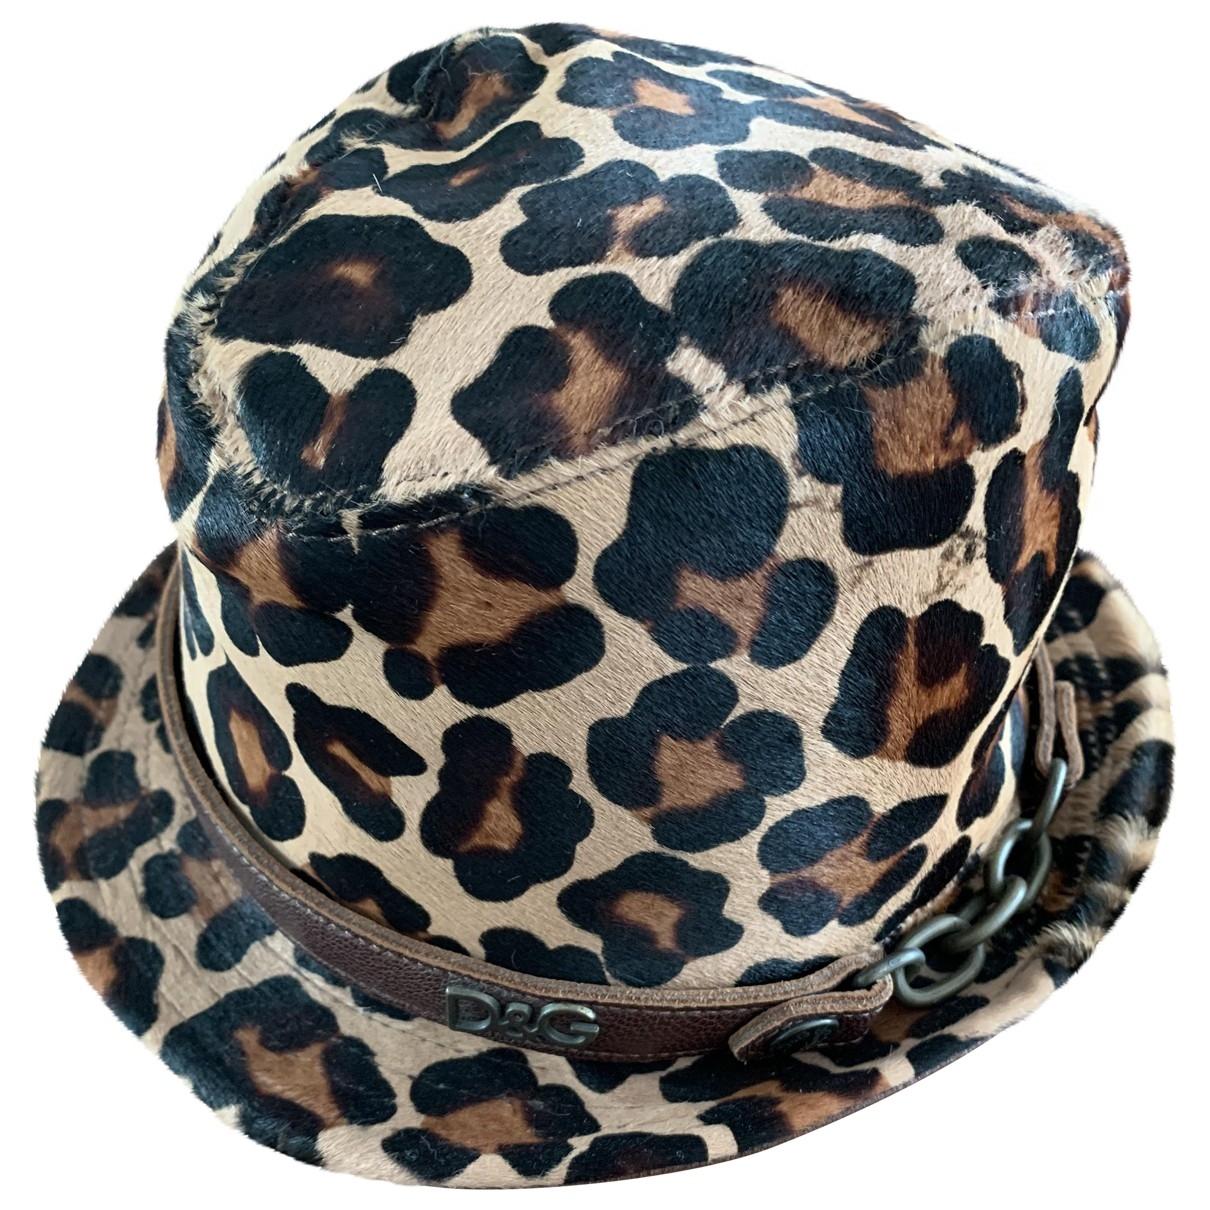 D&g \N Multicolour Leather hat for Women M International